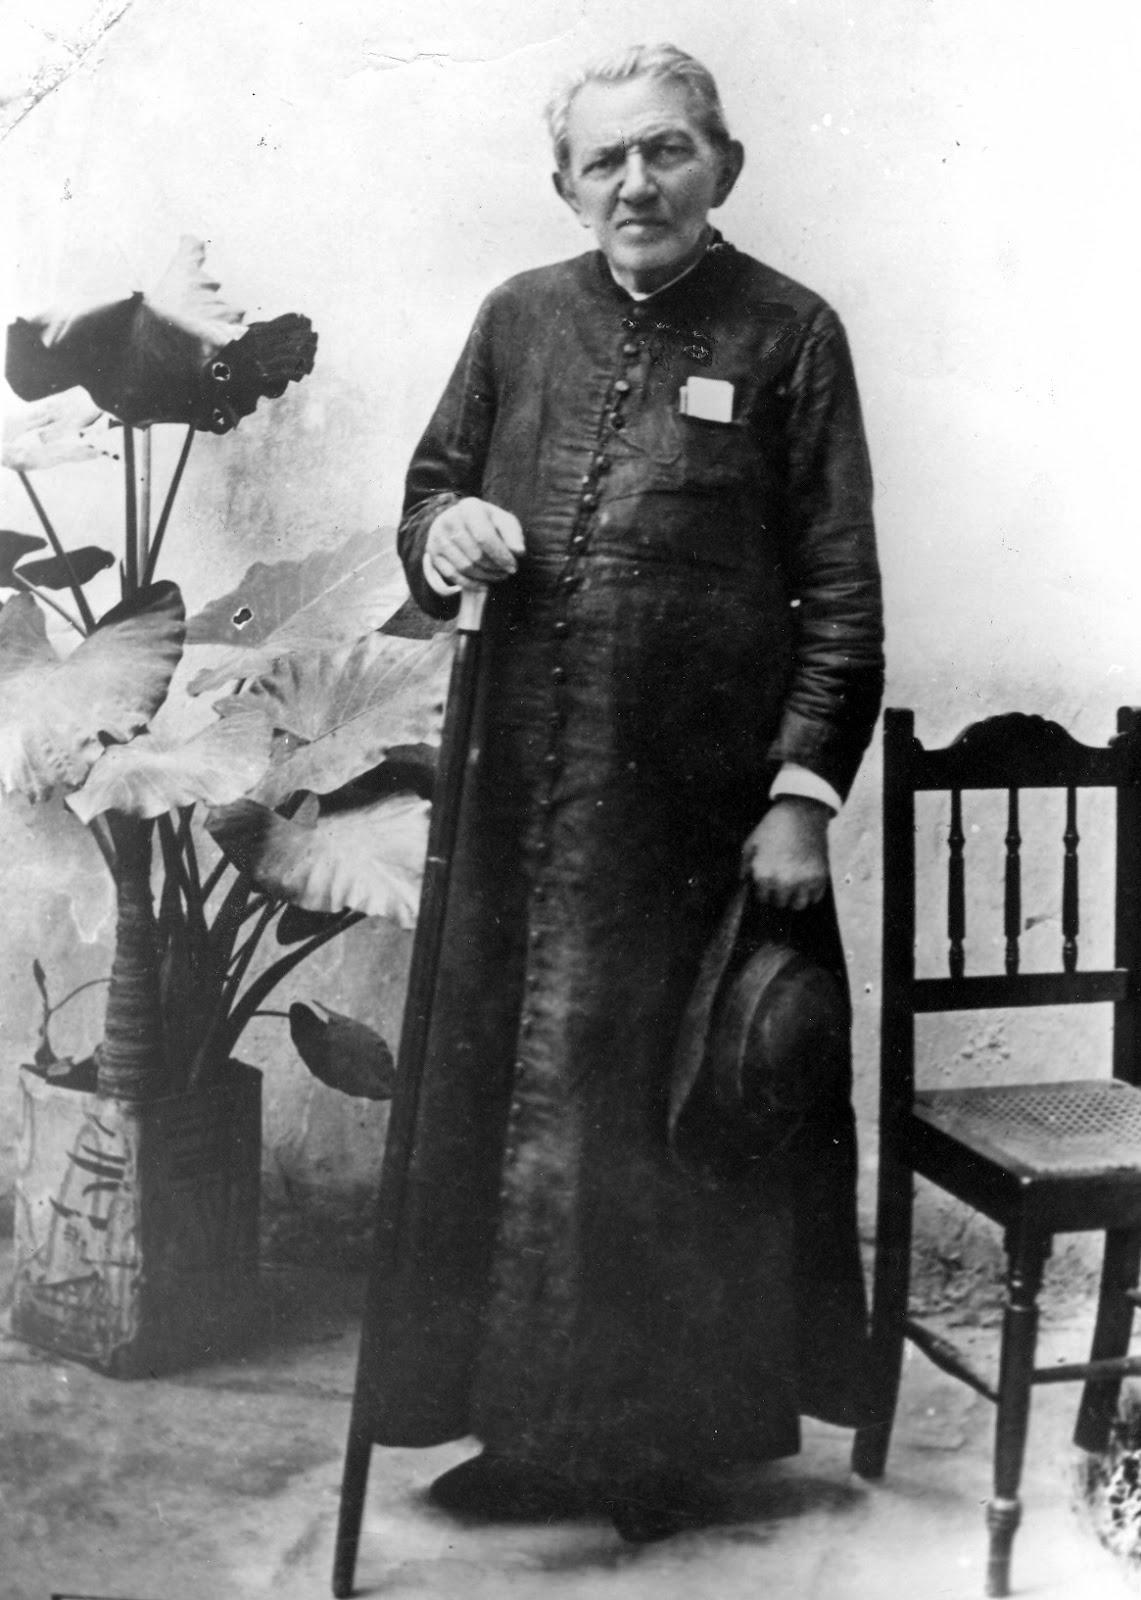 Pe. Cícero Romão Batista